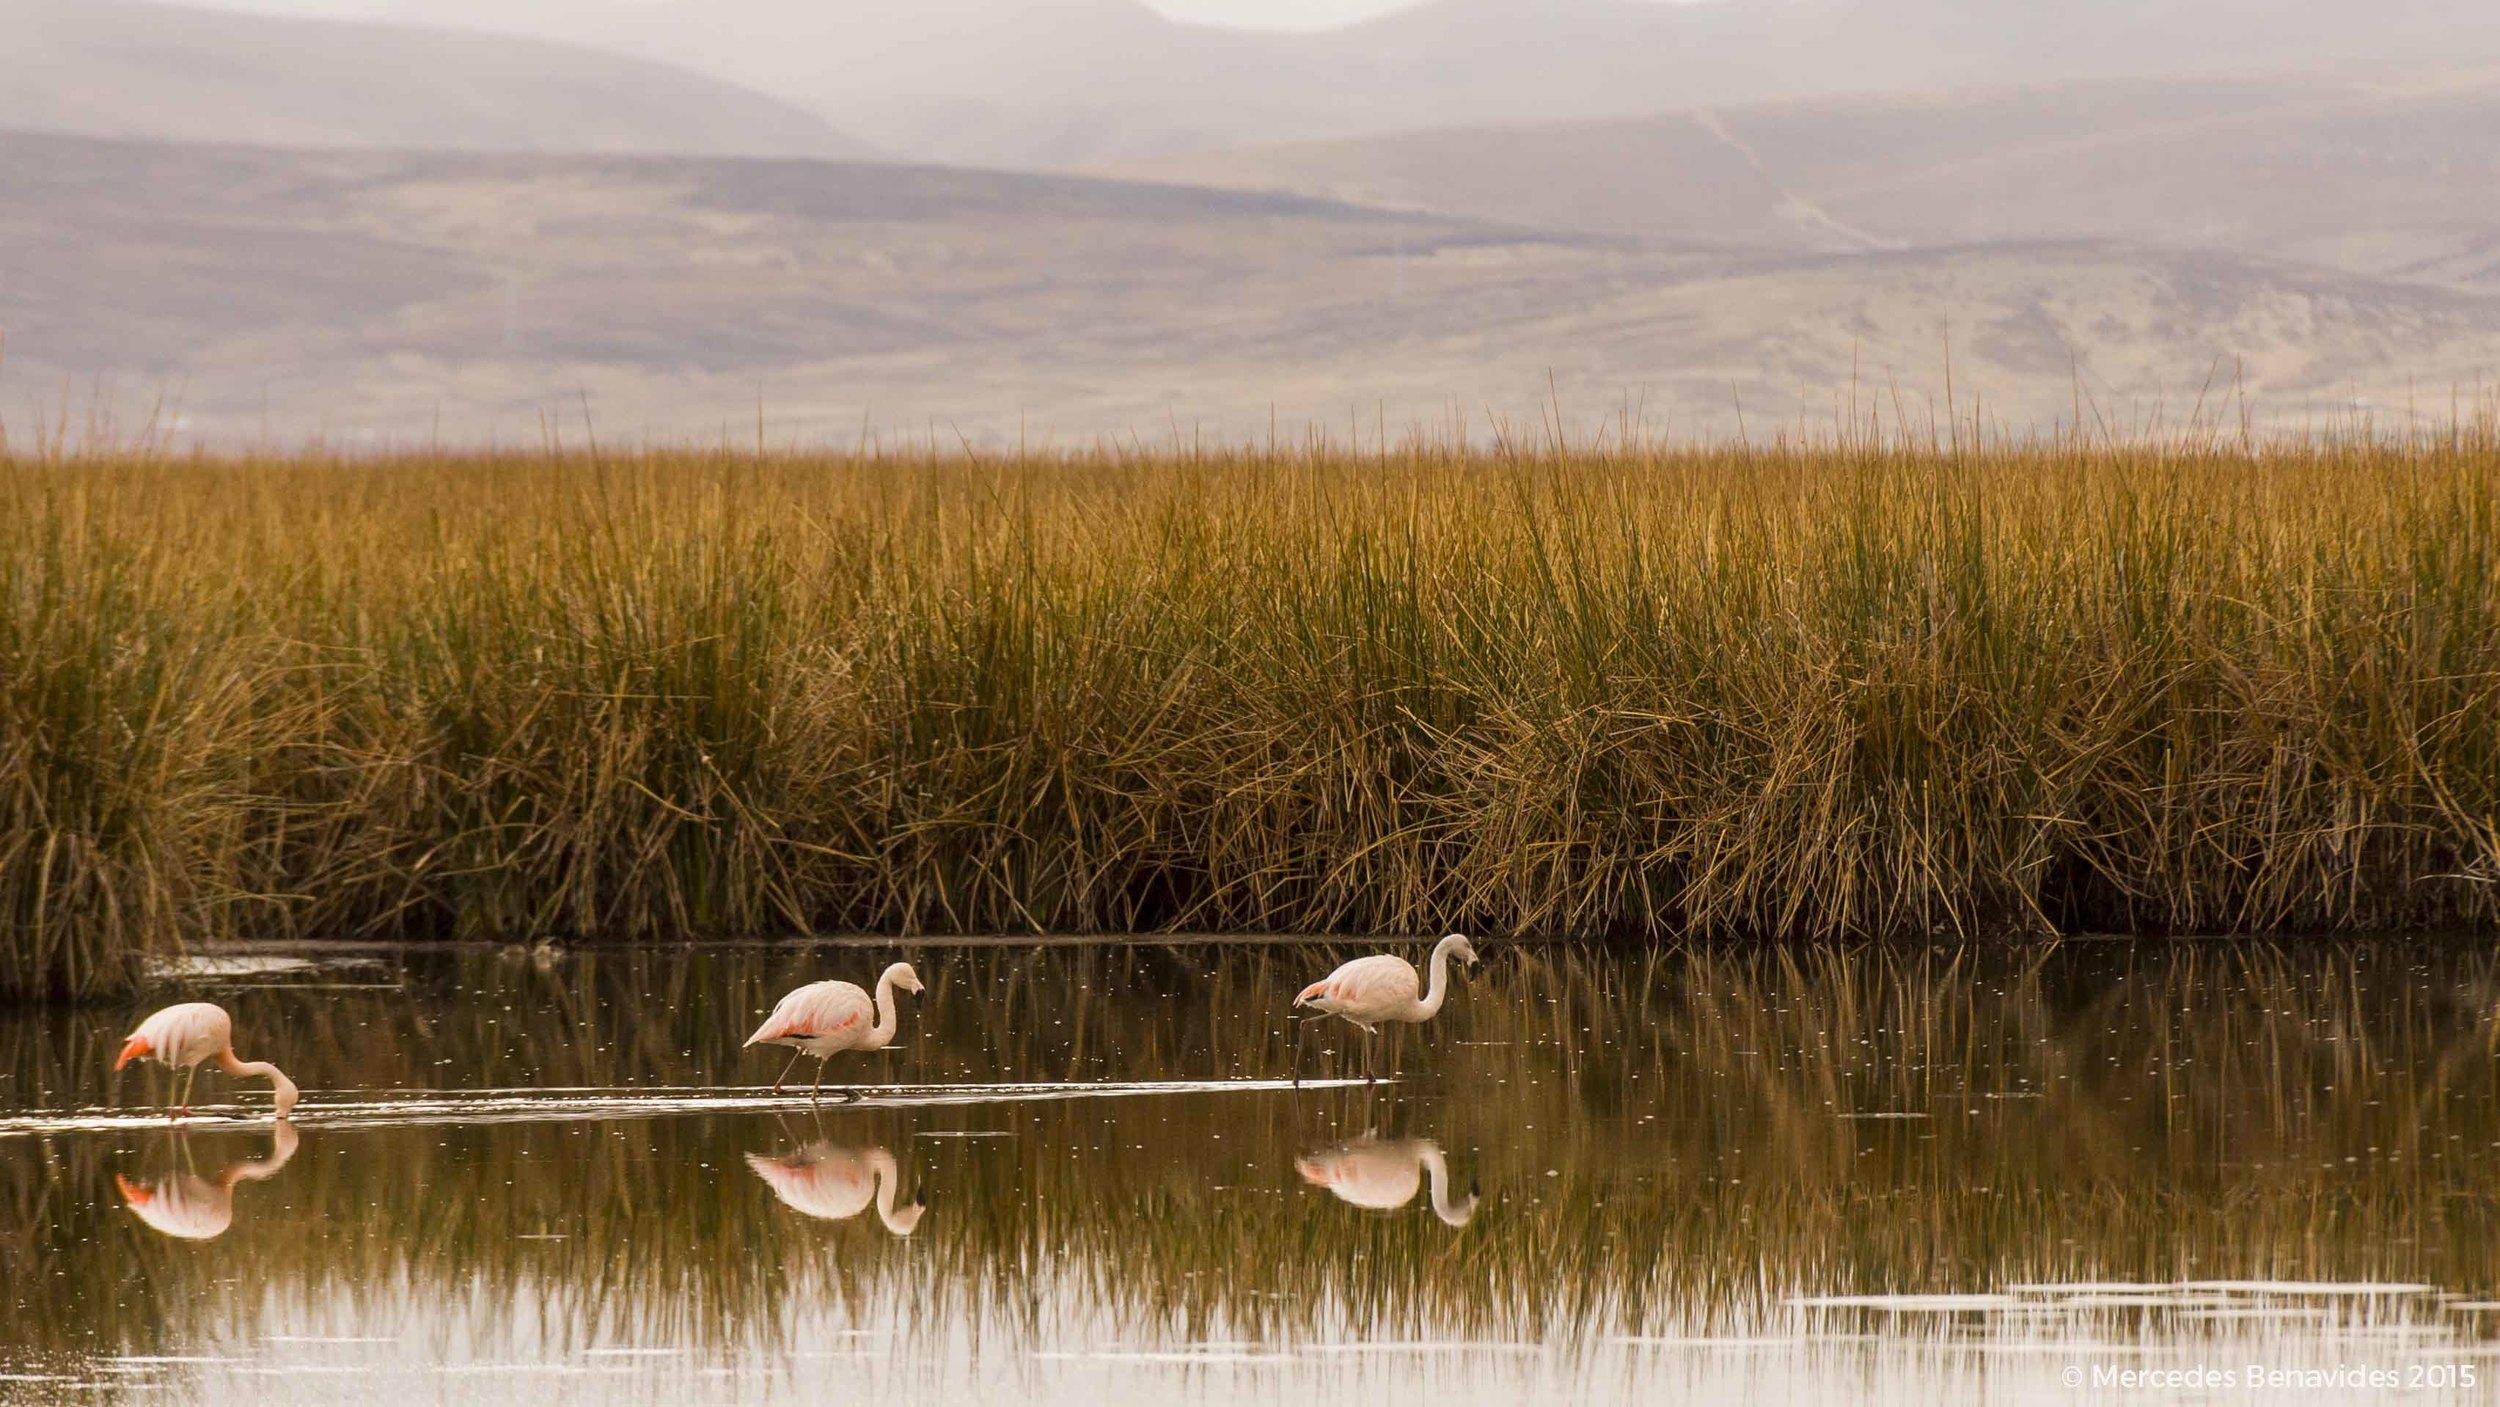 Parihuana Común / Chilean Flamingo  (Phoenicopterus chilensis)   IUCN: (NT) Casi Amenazado / Near Threatened